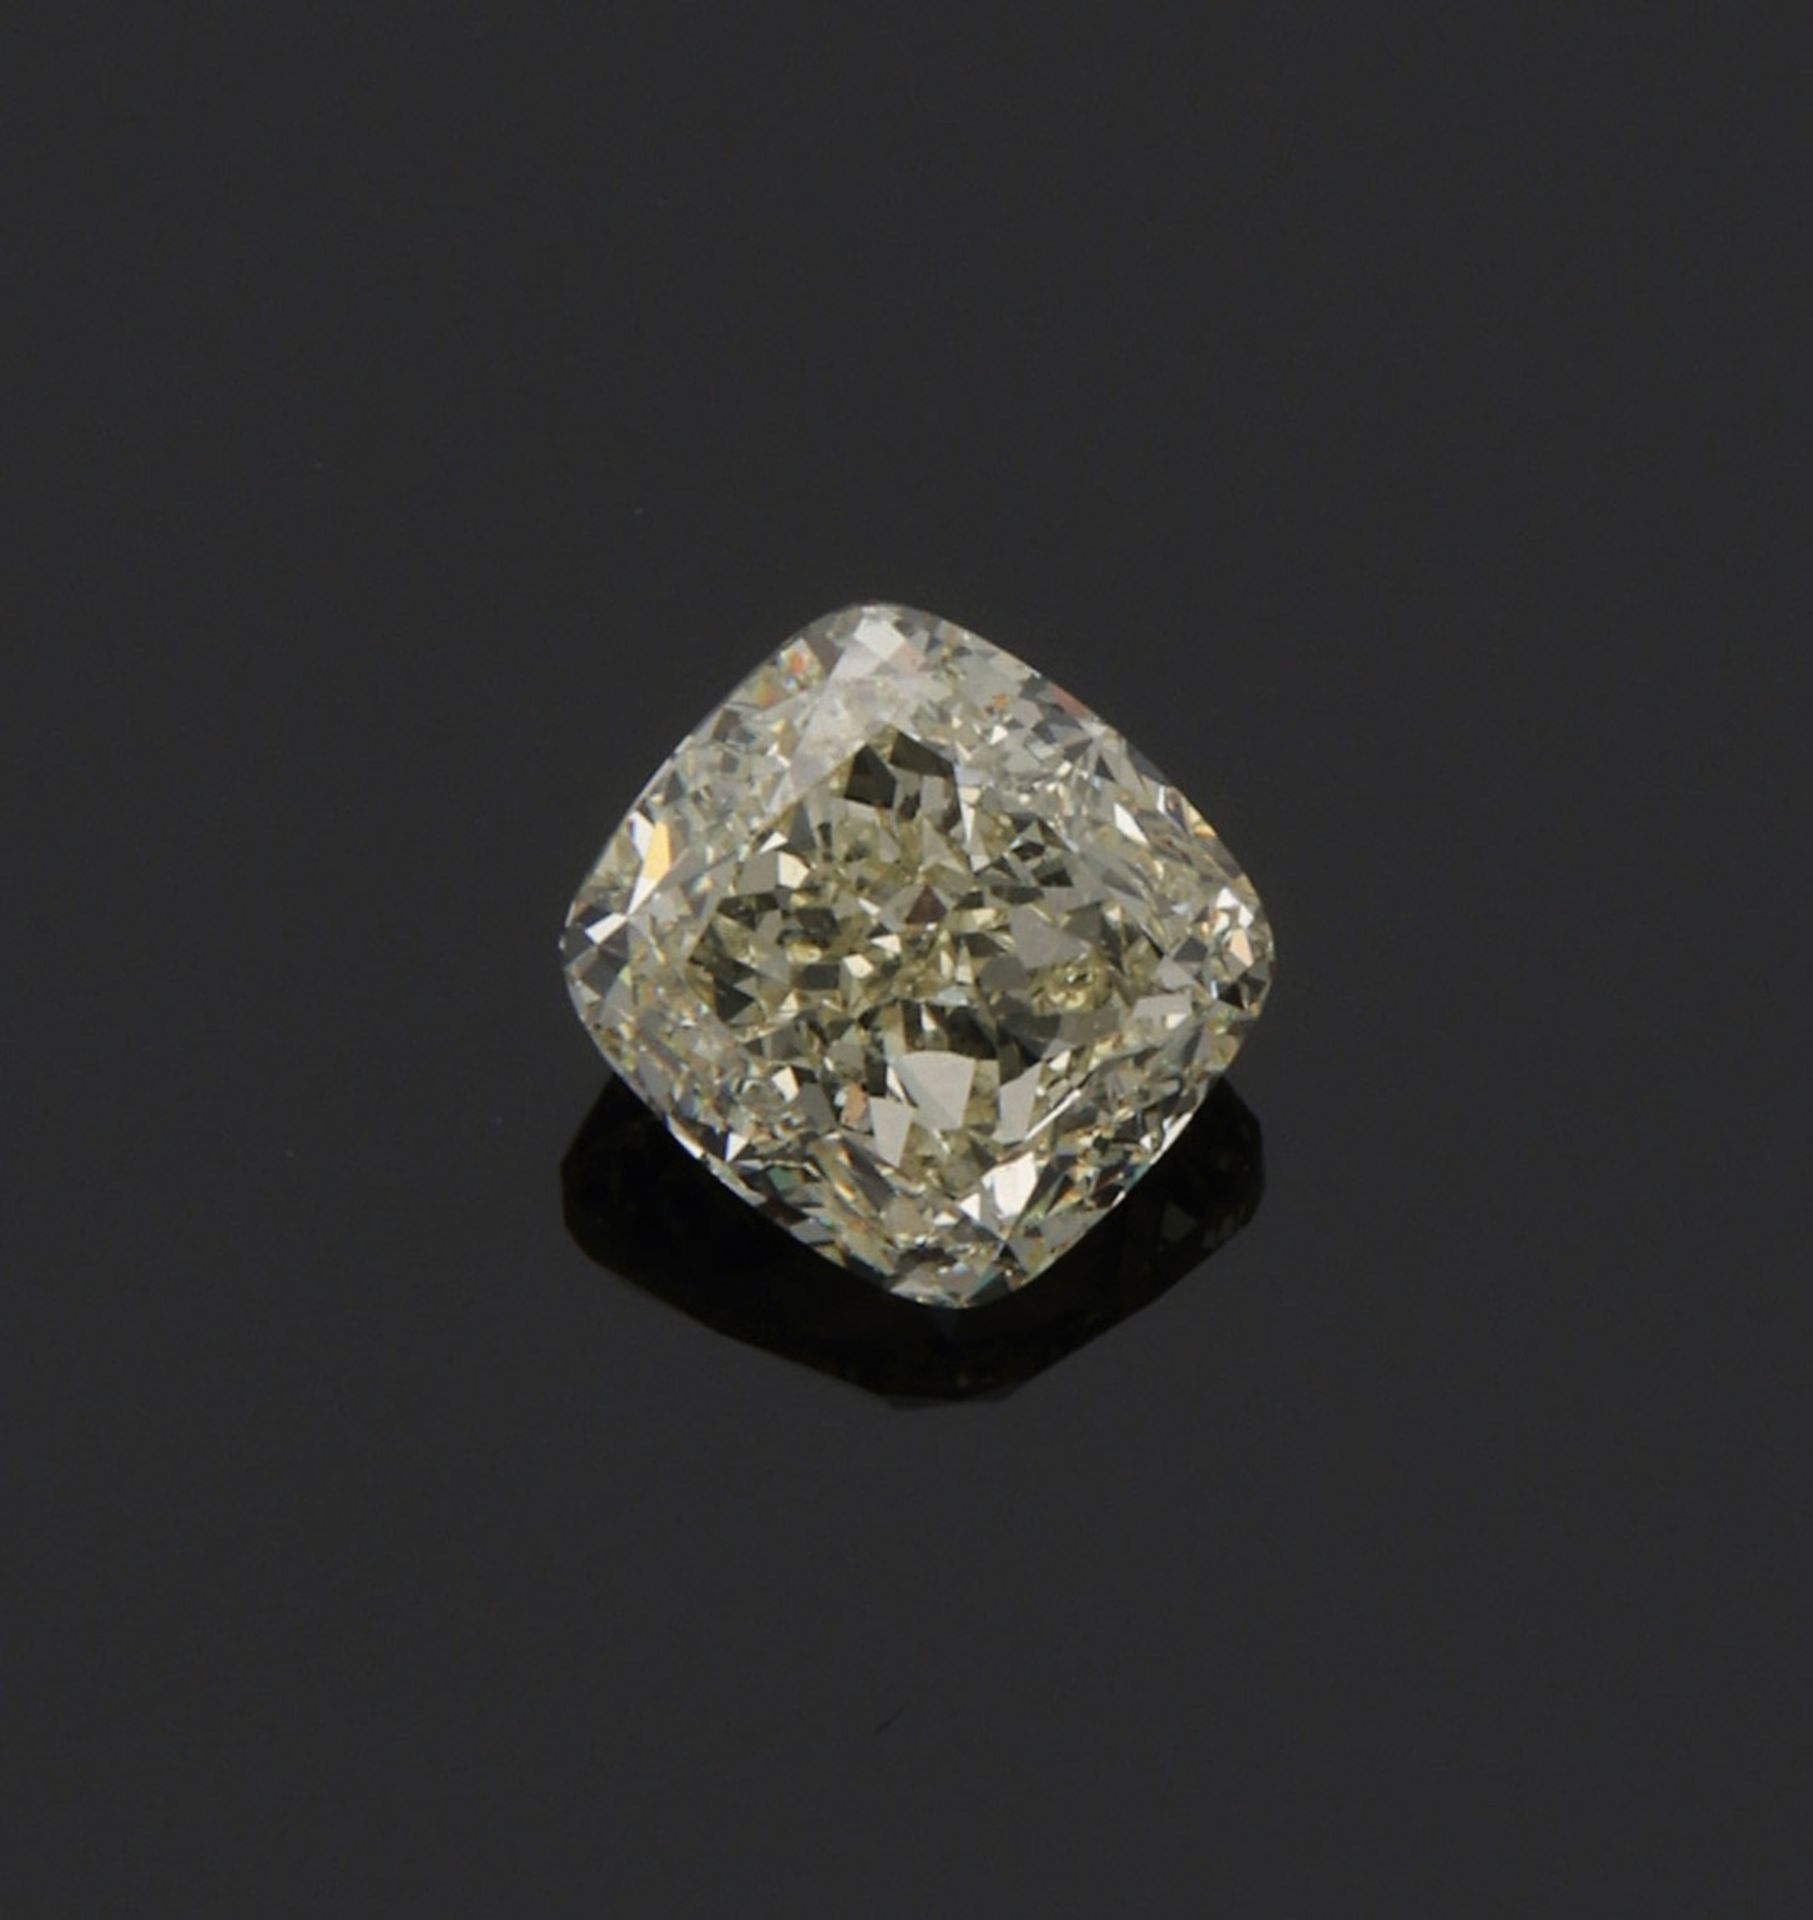 Diamantsolitär im Cushioncut